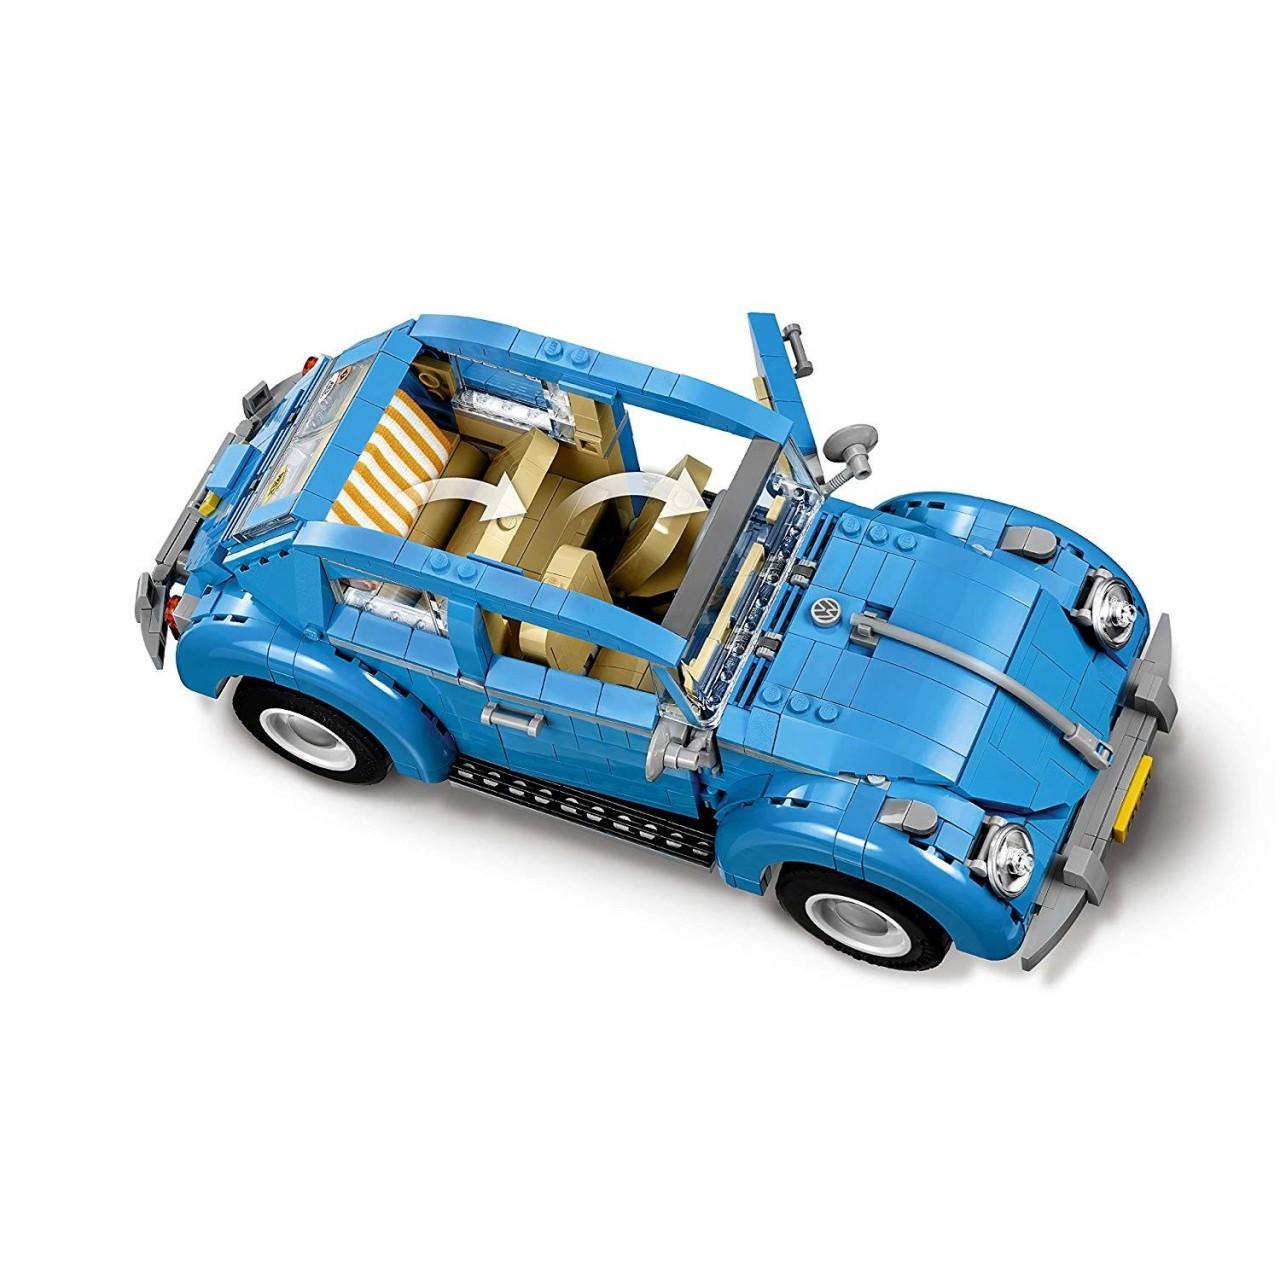 LEGO CREATOR 10252 VW Käfer